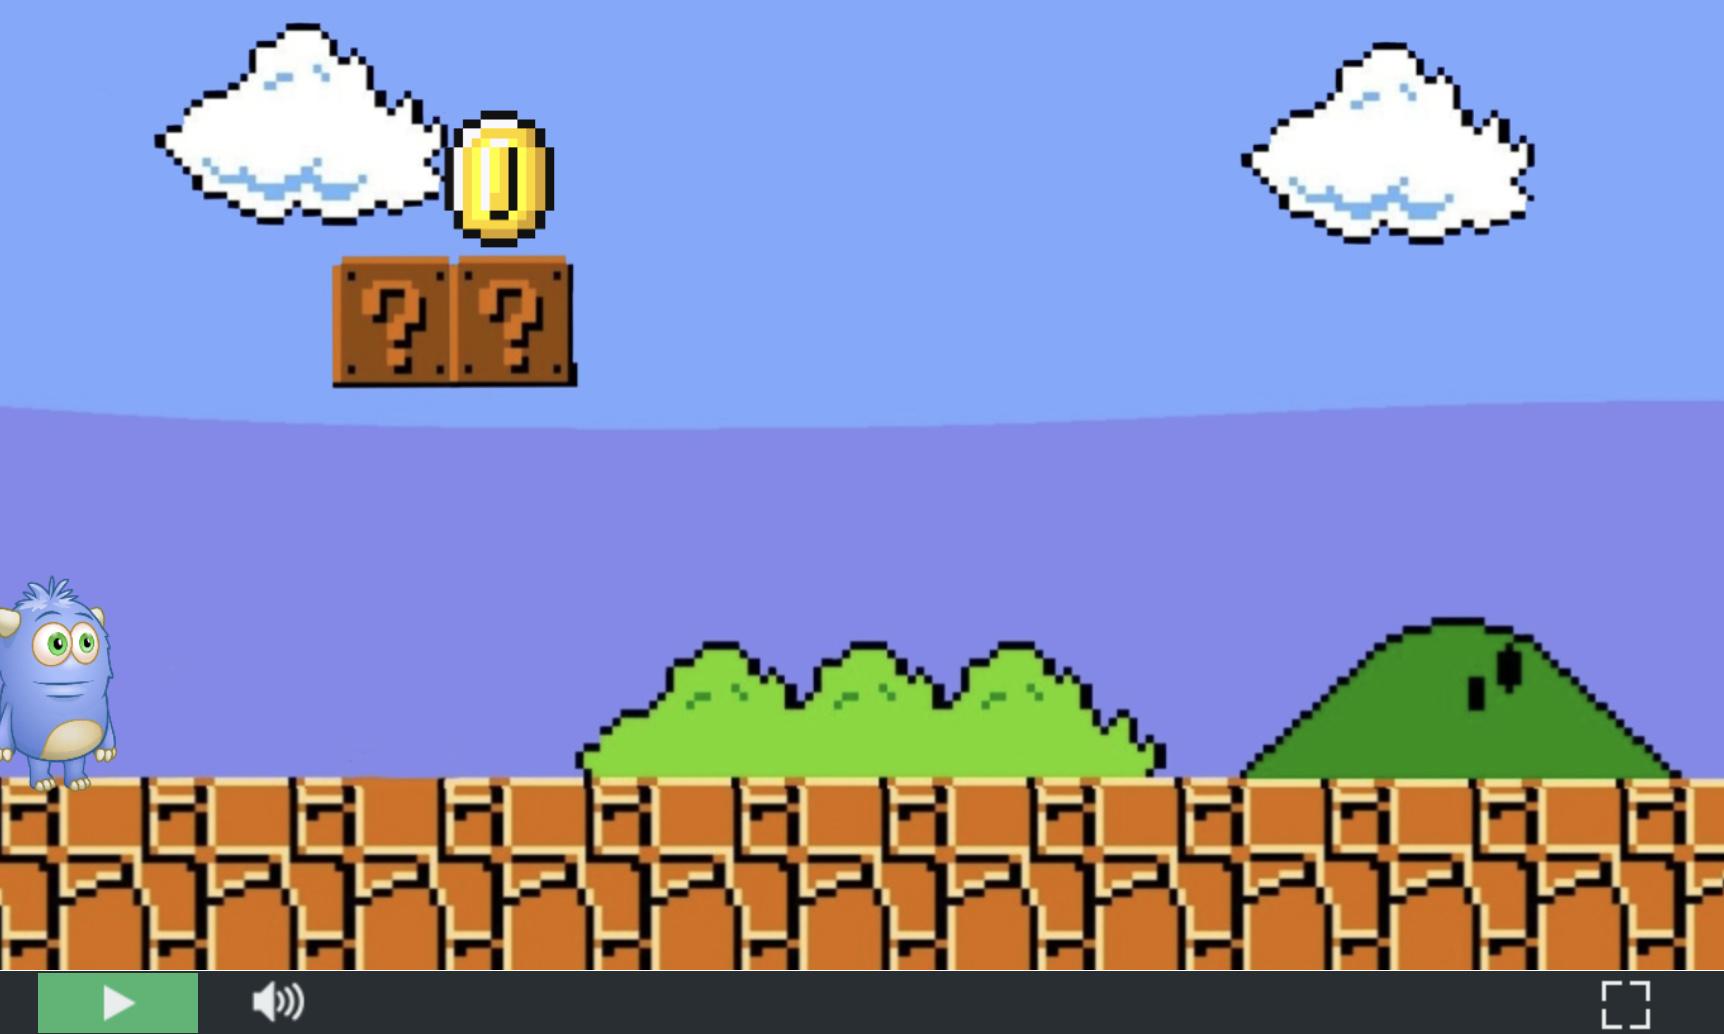 DC-Mario-Game-Cali-Connor-Khaled